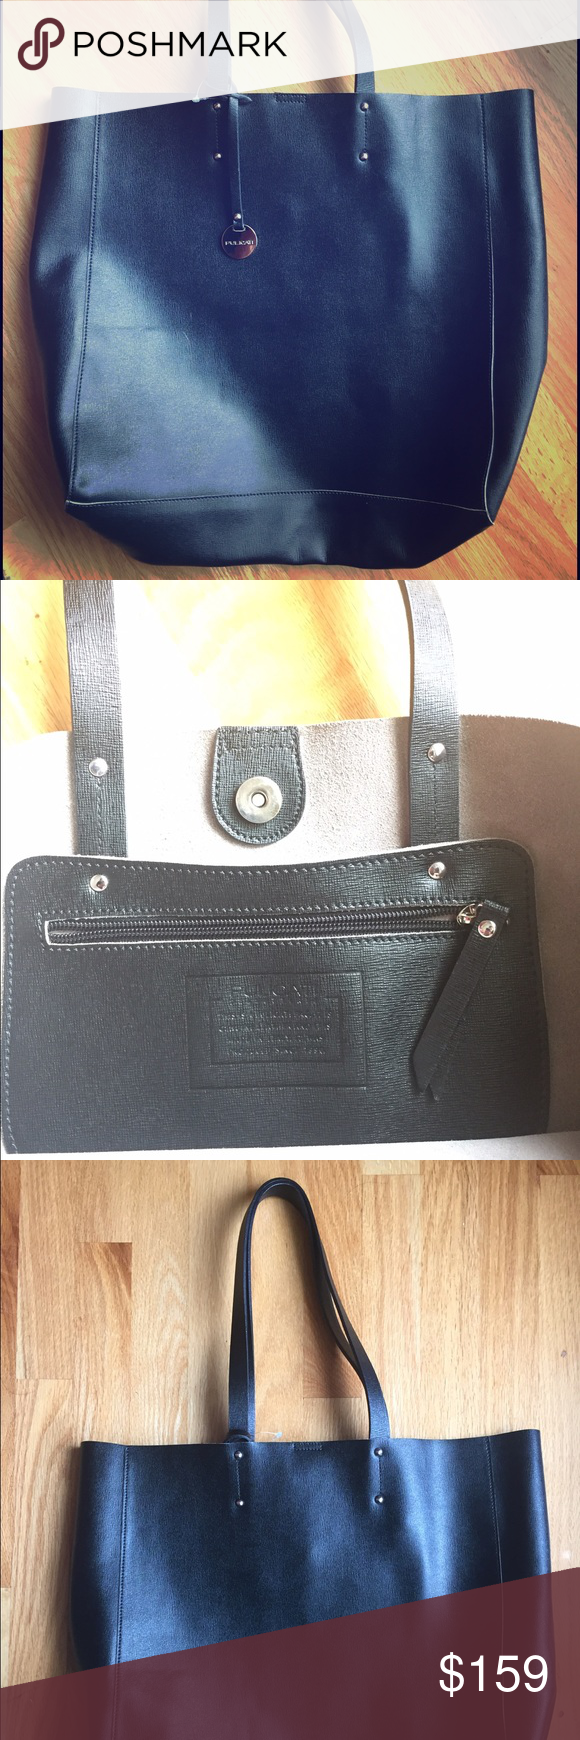 f8d274181f Pulicati large black soft leather tote